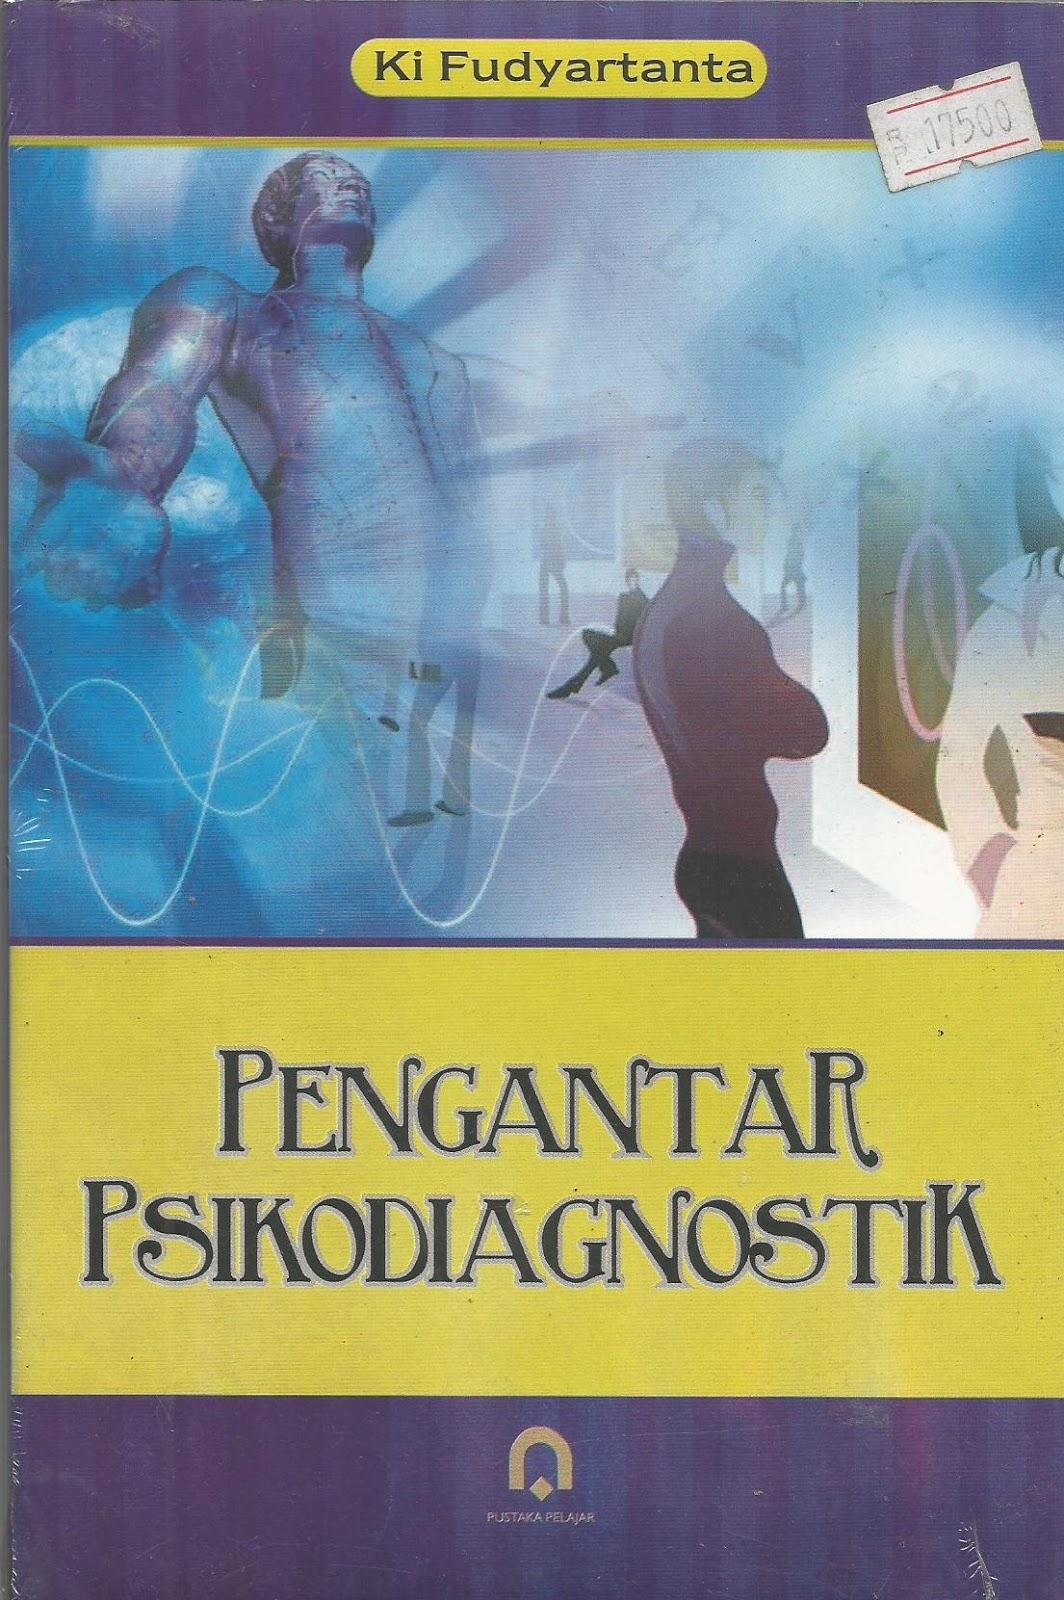 Pengantar Psikodiagnostik